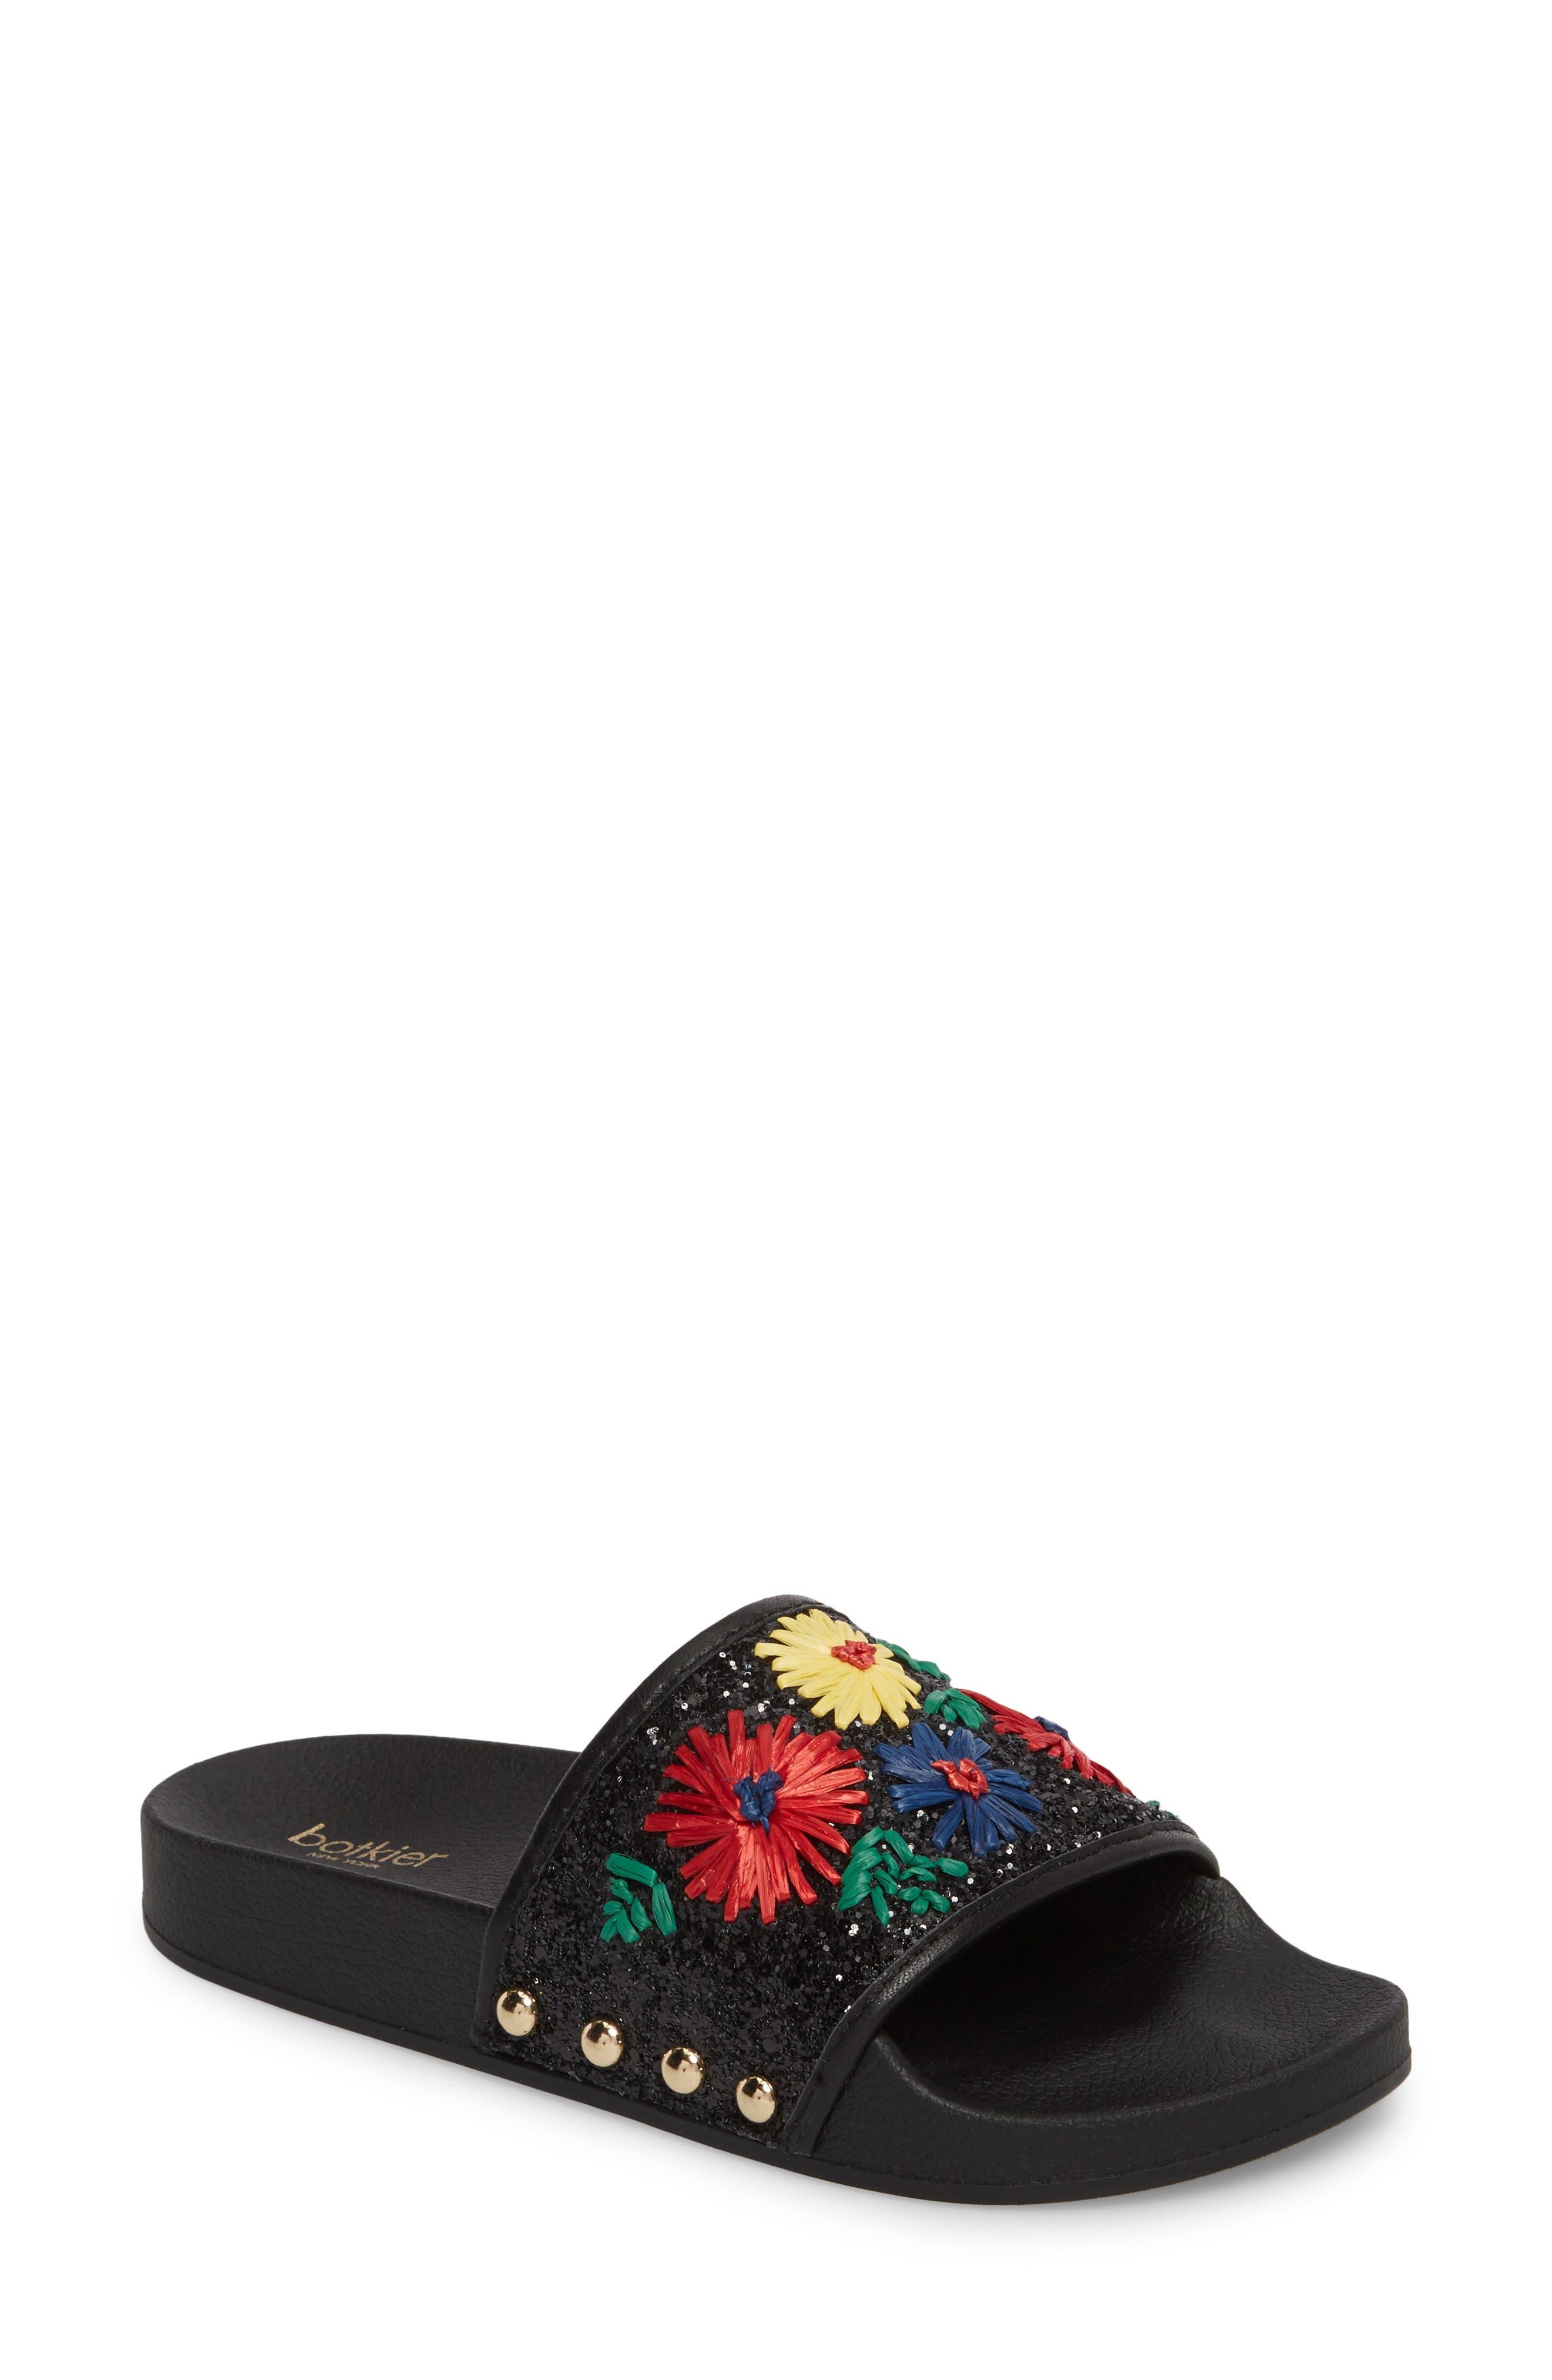 Daisy Slide Sandal,                             Main thumbnail 1, color,                             BRIGHT FLORAL PRINT